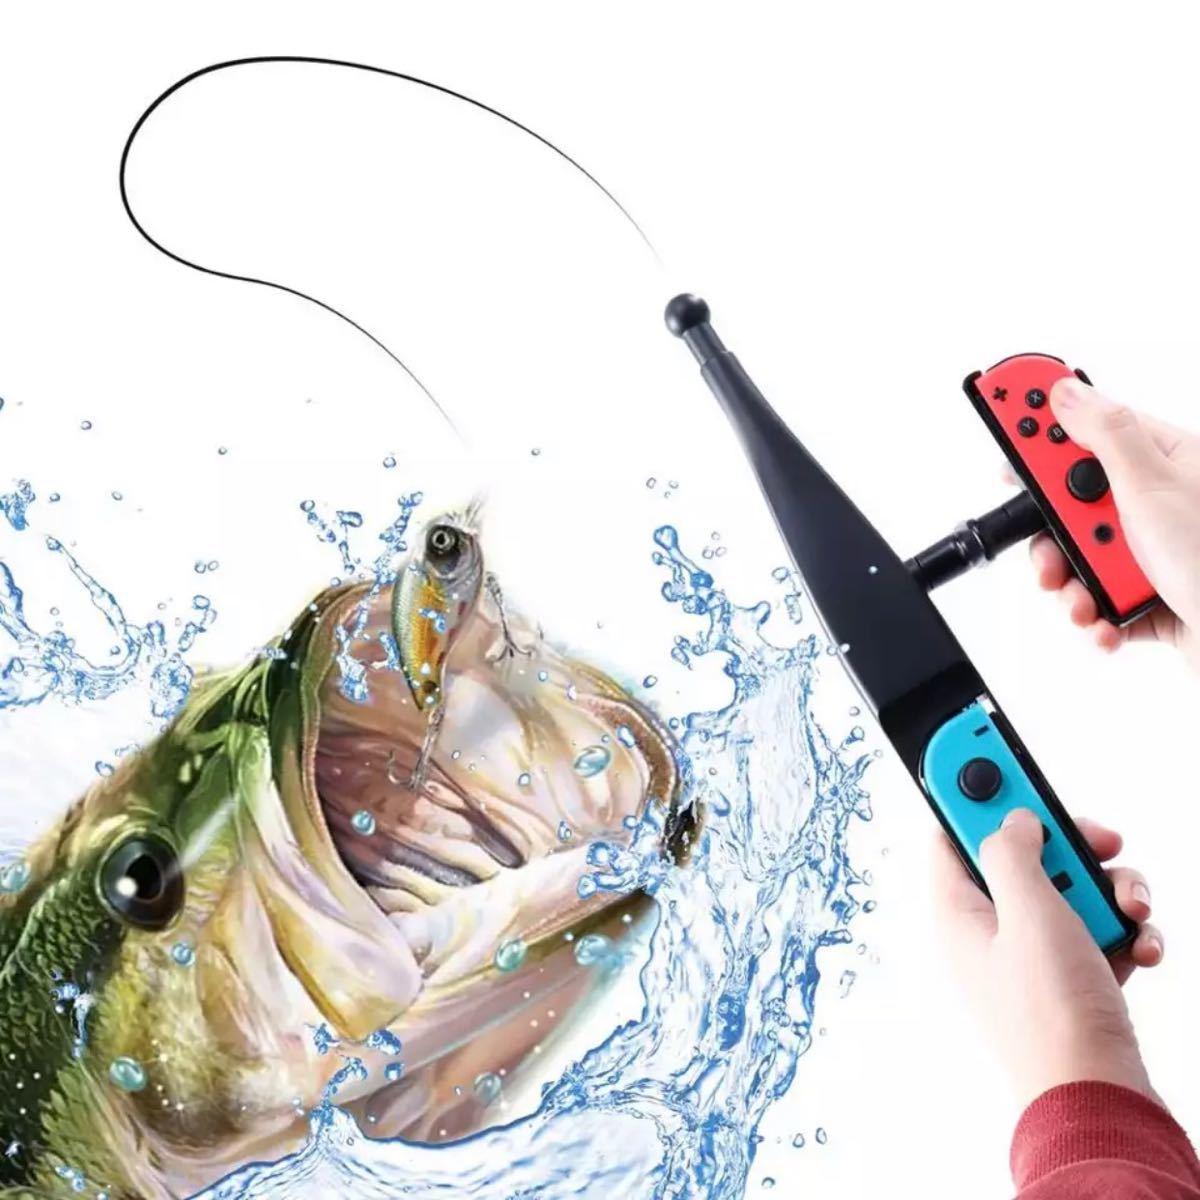 Switch ジョイコン用 釣りロッド 釣り竿 釣竿 釣りスピリッツ対応